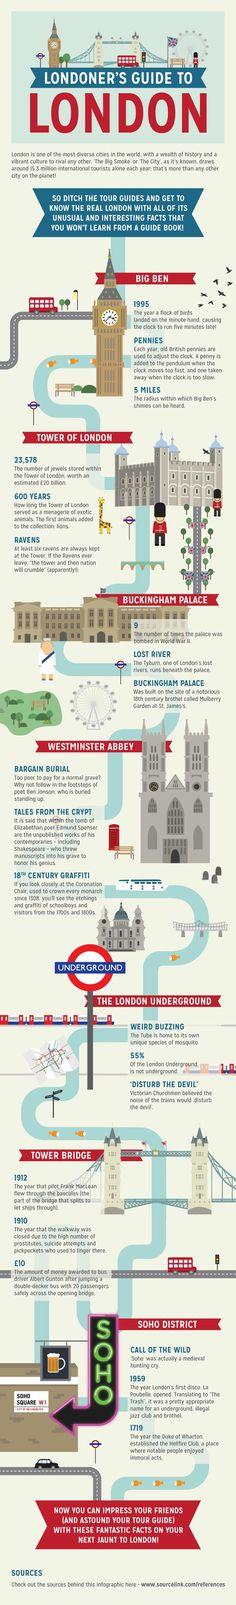 Londoner's Guide To London - Cool Stuff - ShortList Magazine